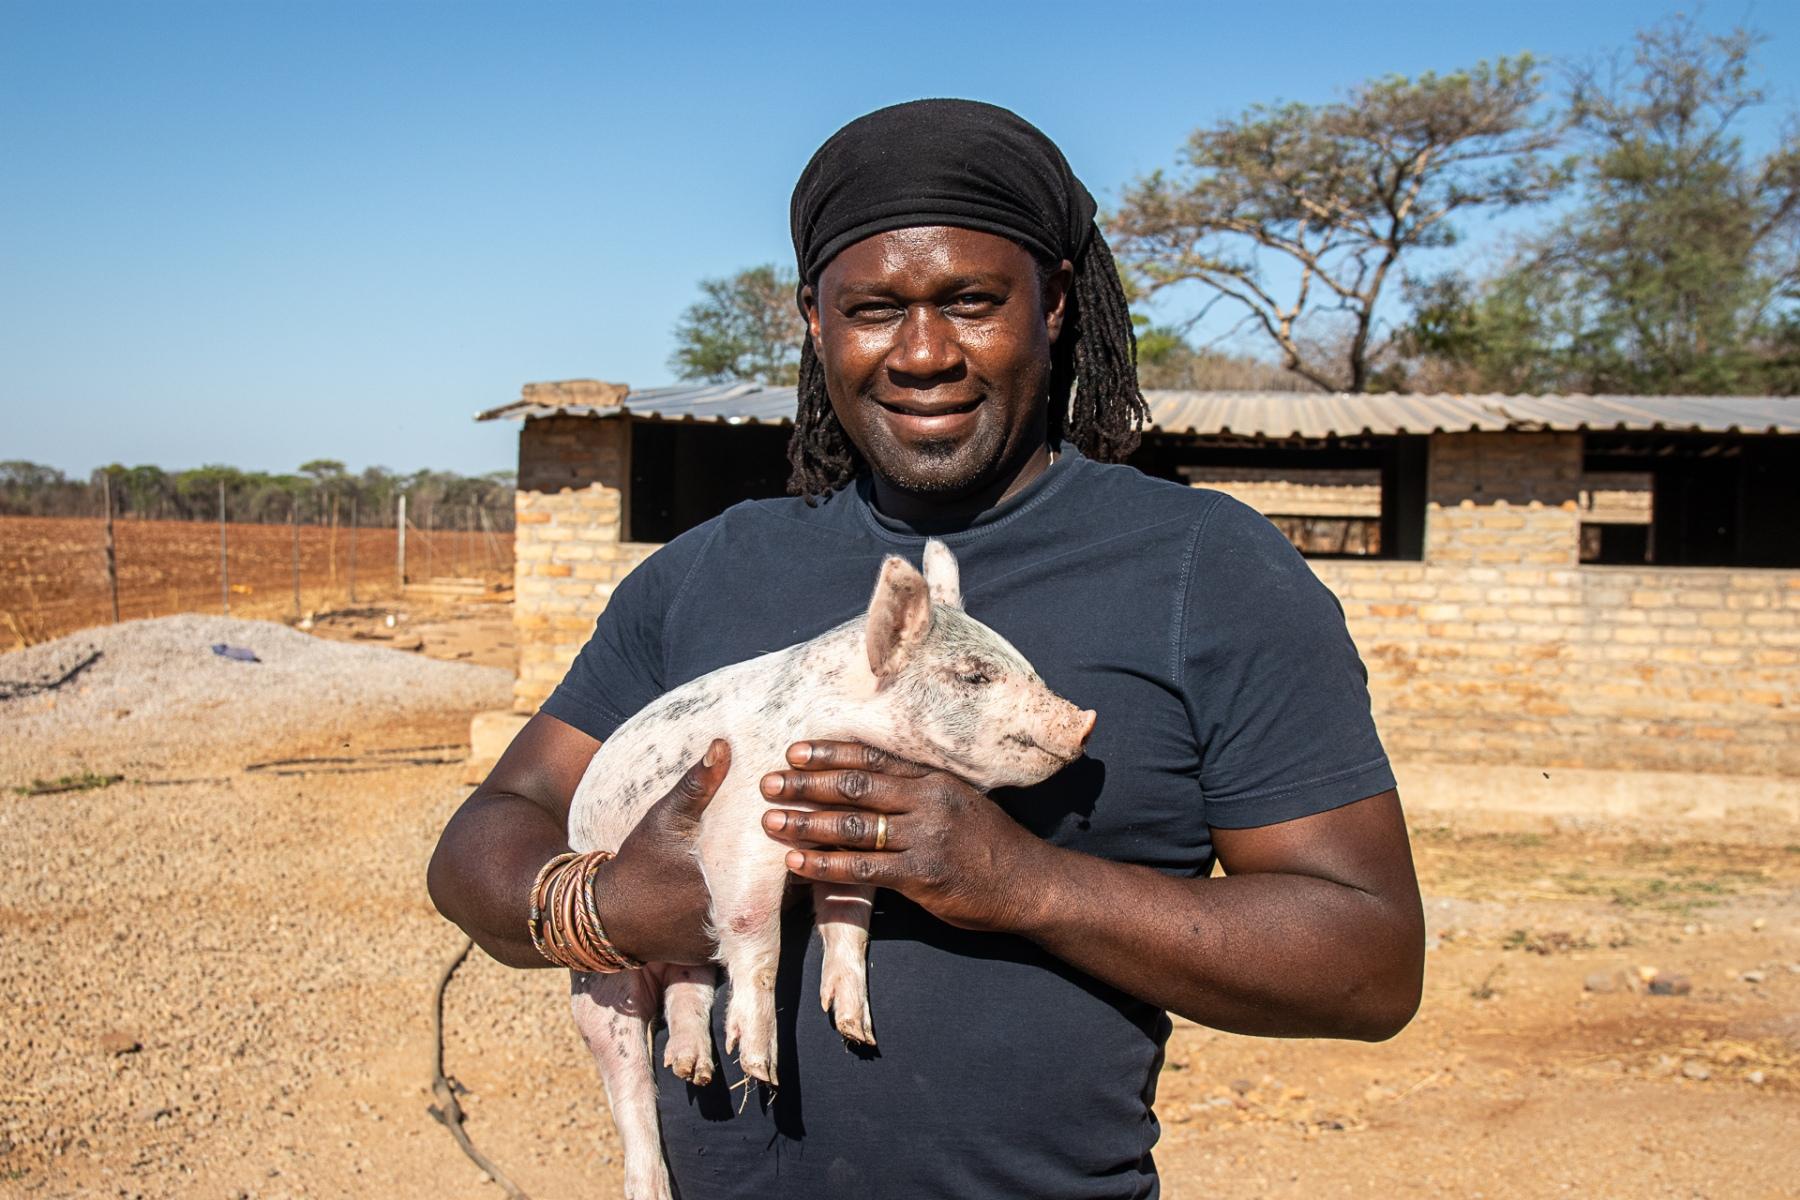 Simbabwe, 2019: Farmer Peter Musavayi